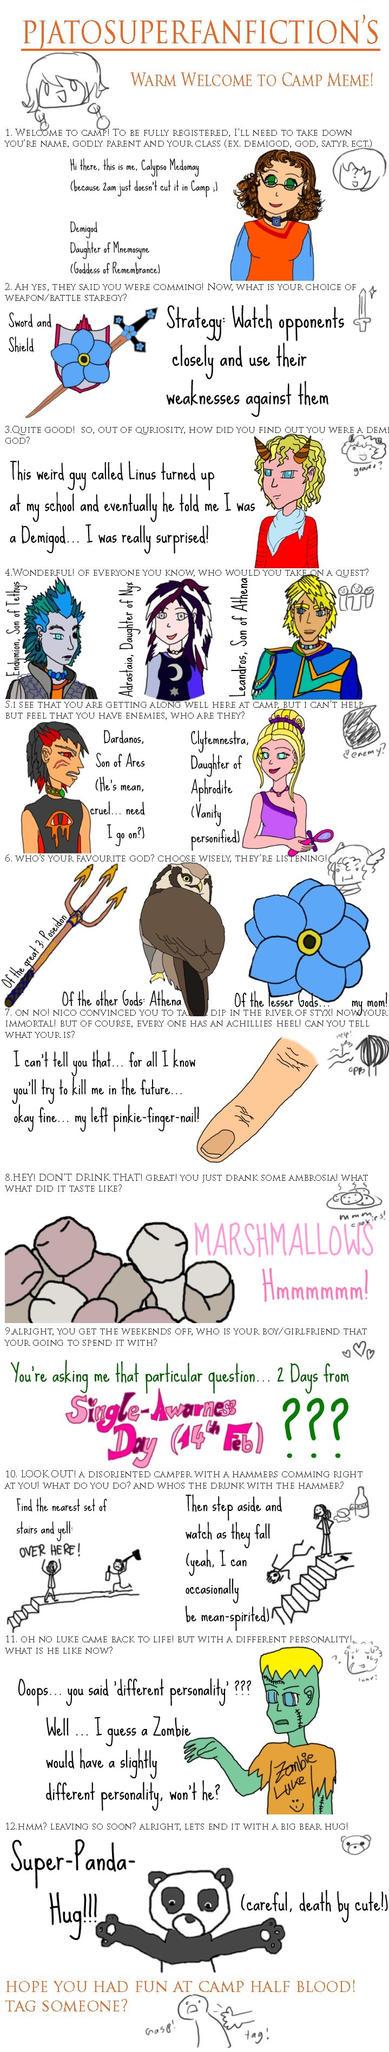 Percy Jackson Meme Picture Percy Jackson Meme Image